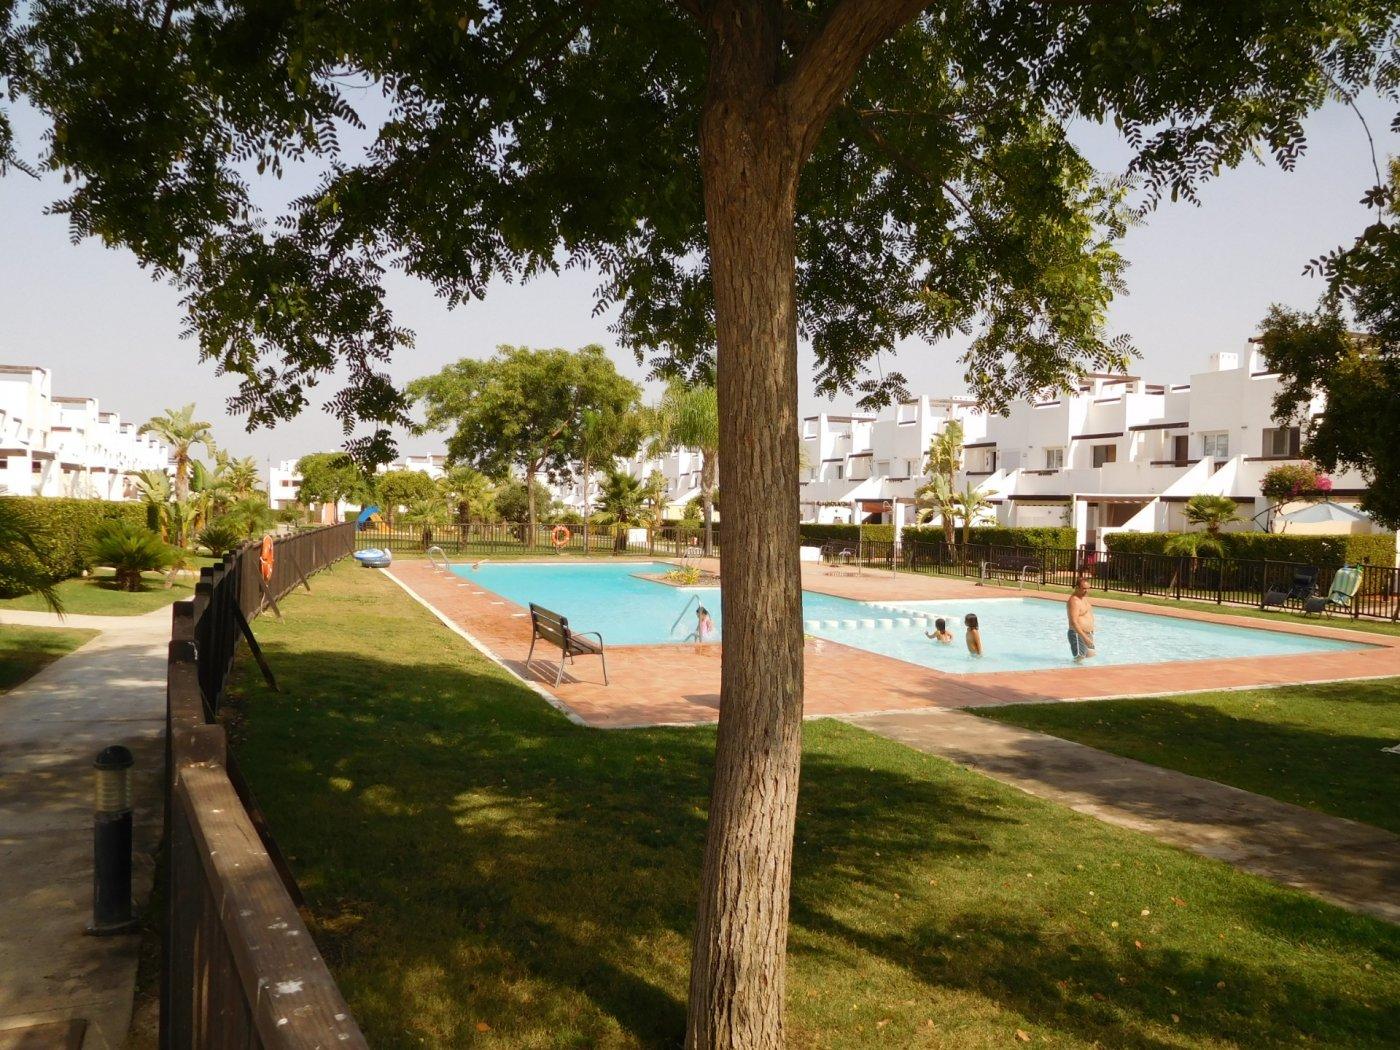 Gallery Image 25 of Apartment For rent in Condado De Alhama, Alhama De Murcia With Pool